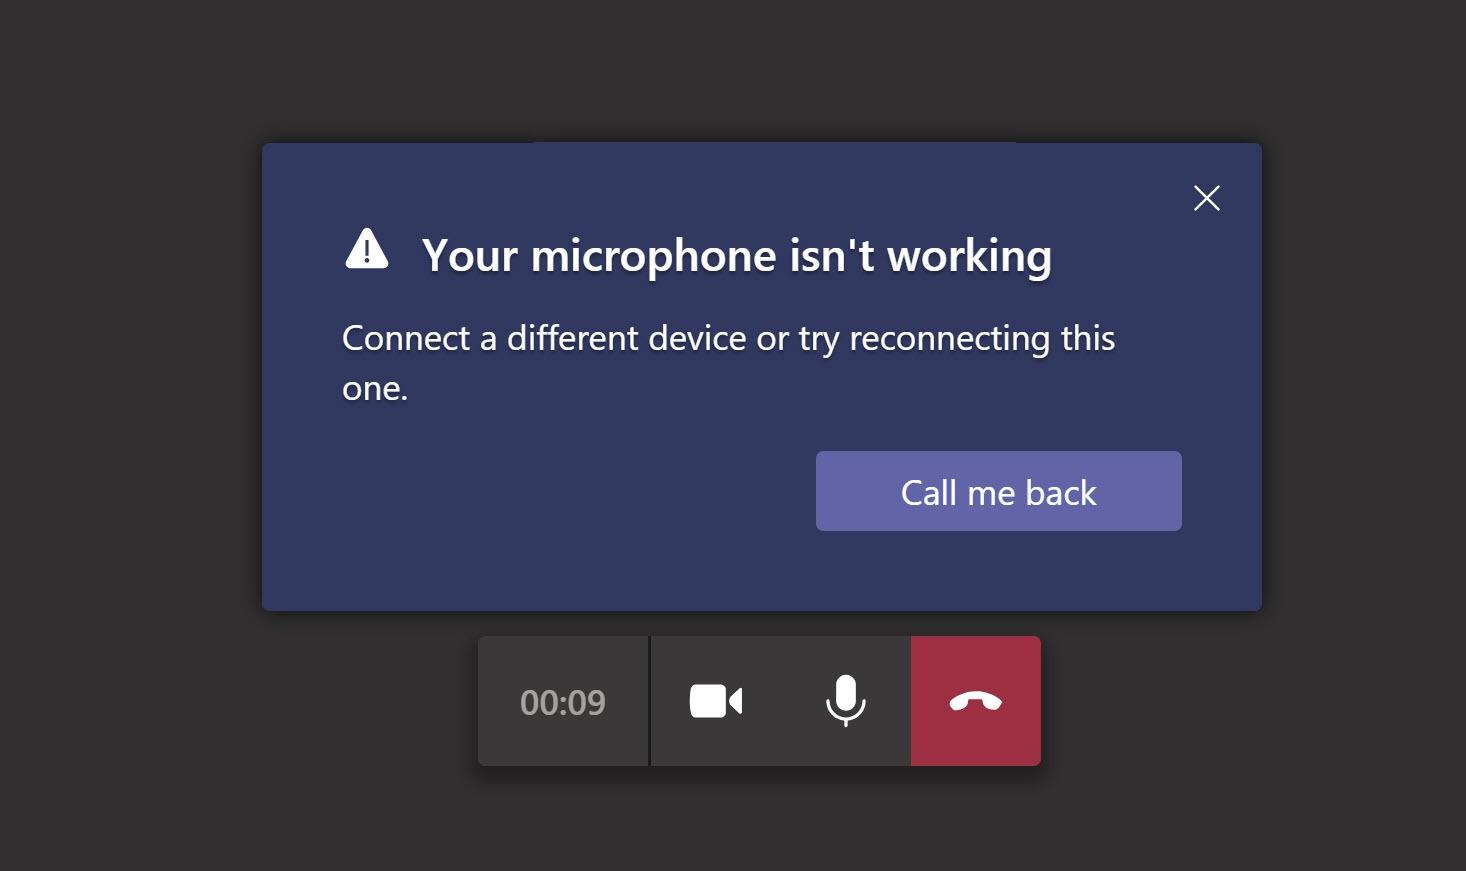 Microsoft teams microphone not working